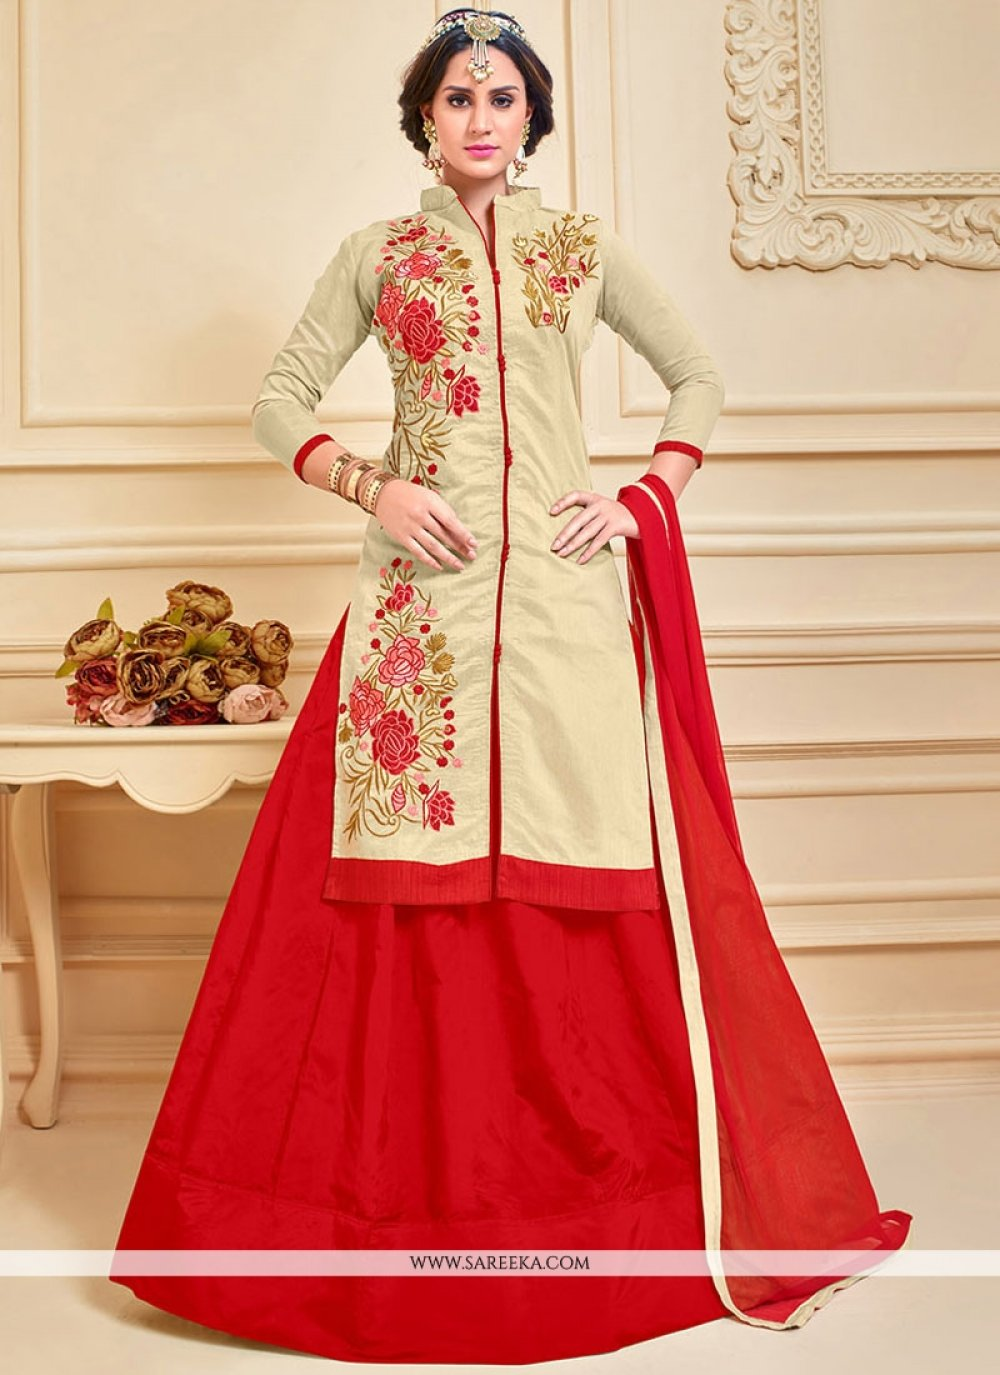 Chanderi Cotton Beige and Red Long Choli Lehenga